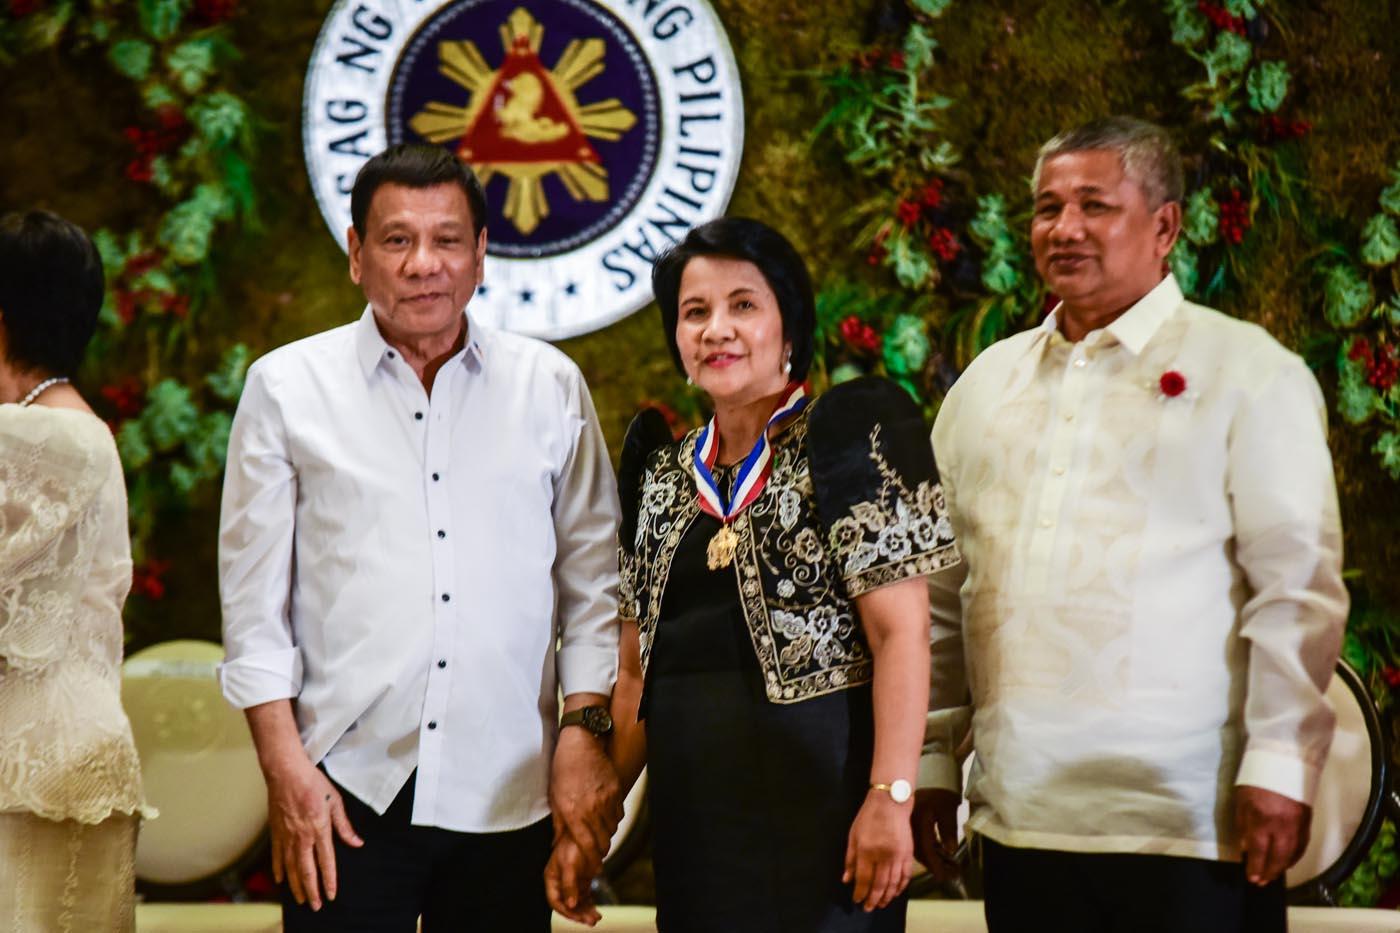 President Rodrigo Duterte with team leader Dalisay Moya